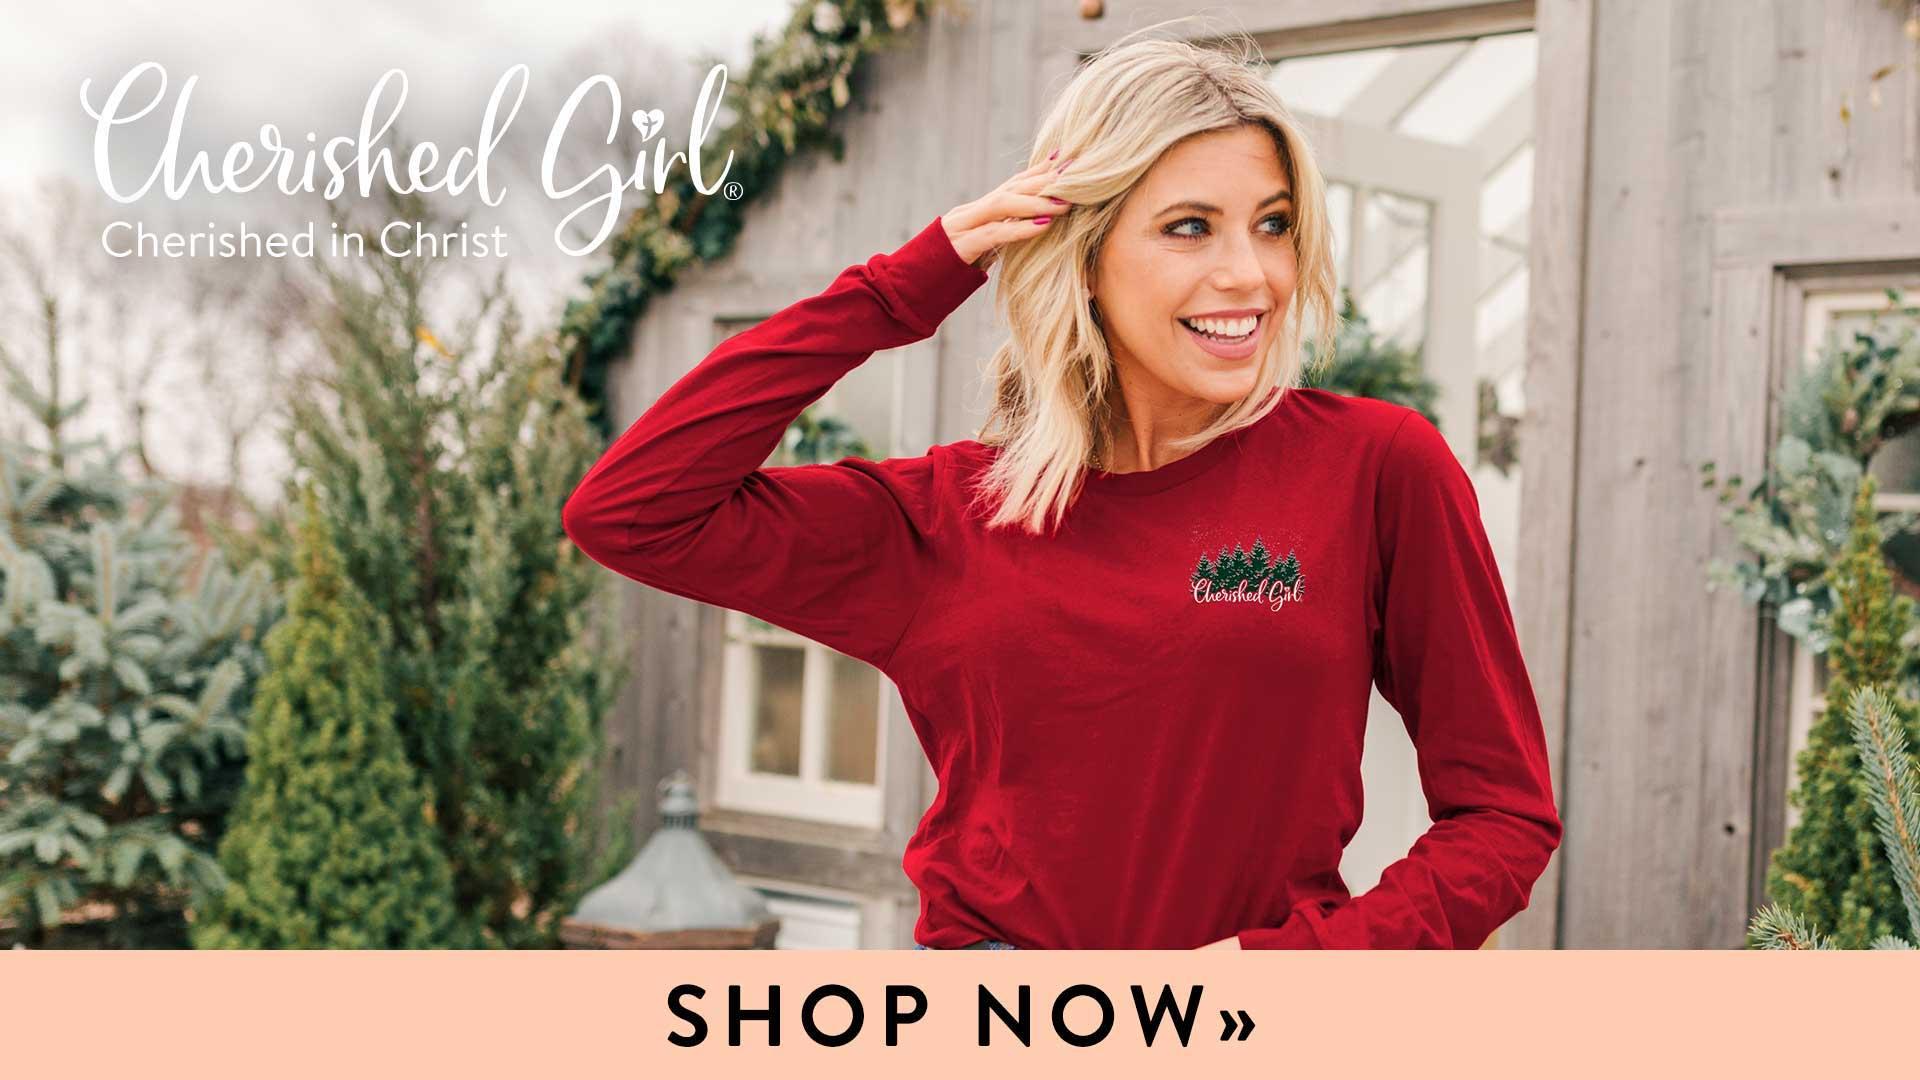 Kerusso Cherished Girl Christian T-shirts for Women Christian Apparel for Women